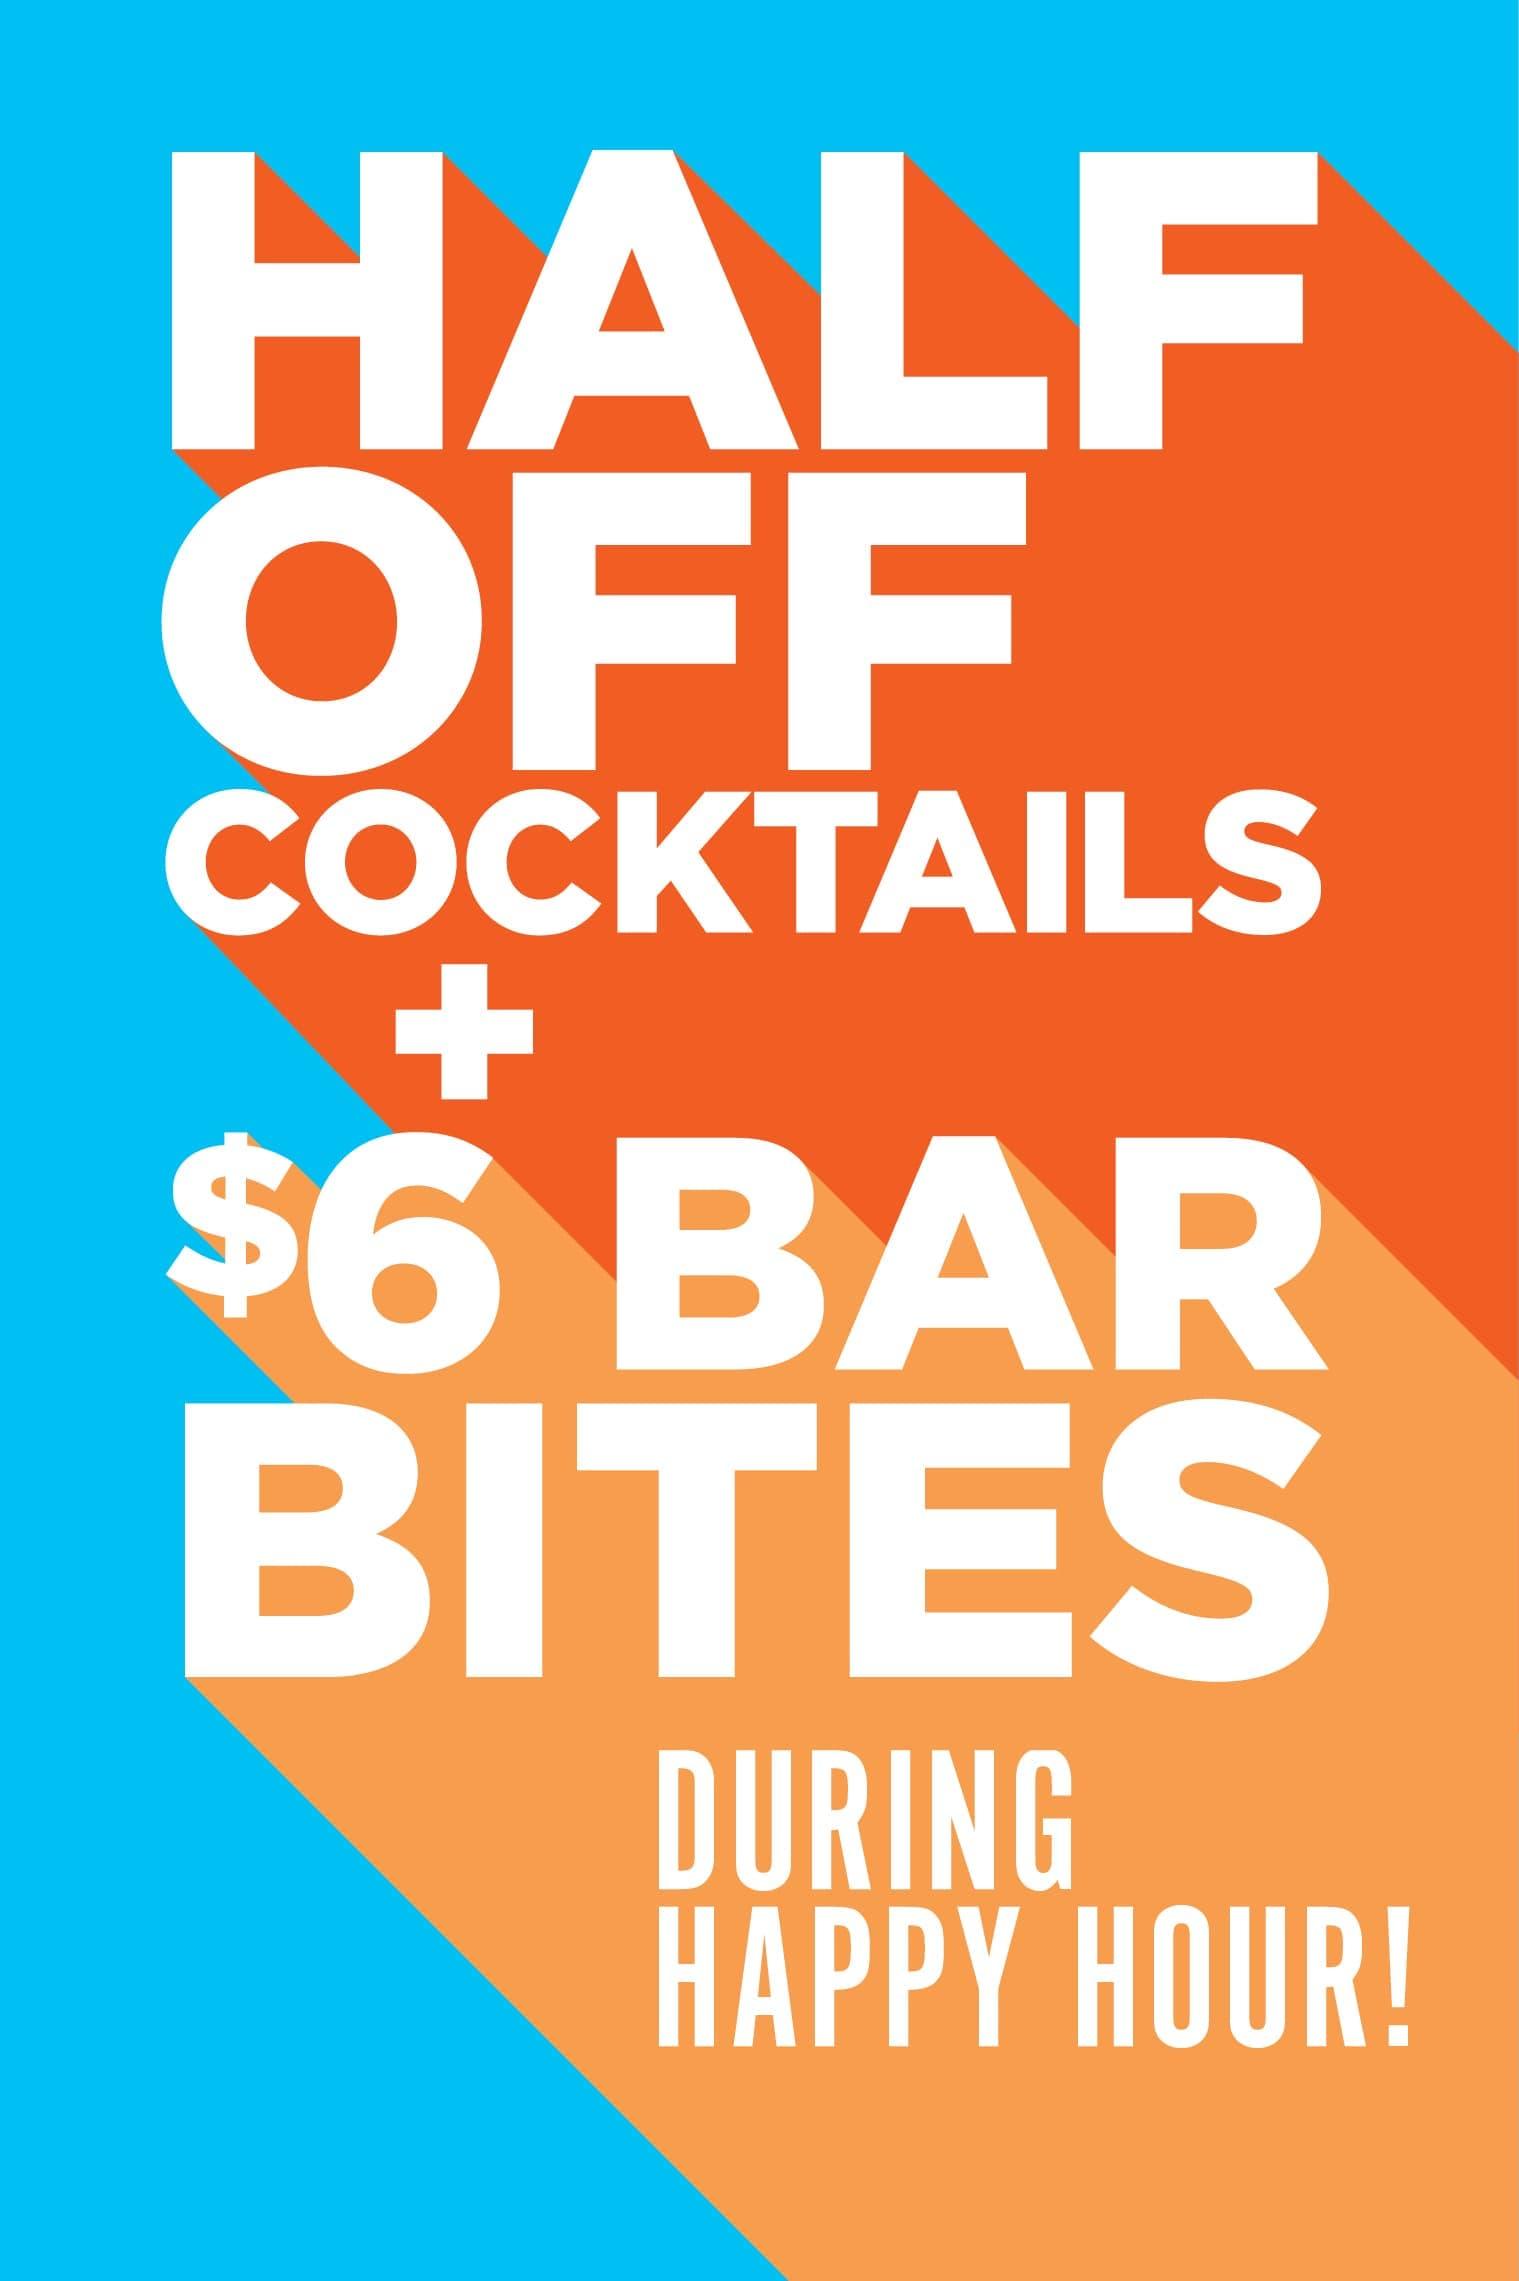 Dave & Buster's | Sports Bar - Milpitas - Restaurants